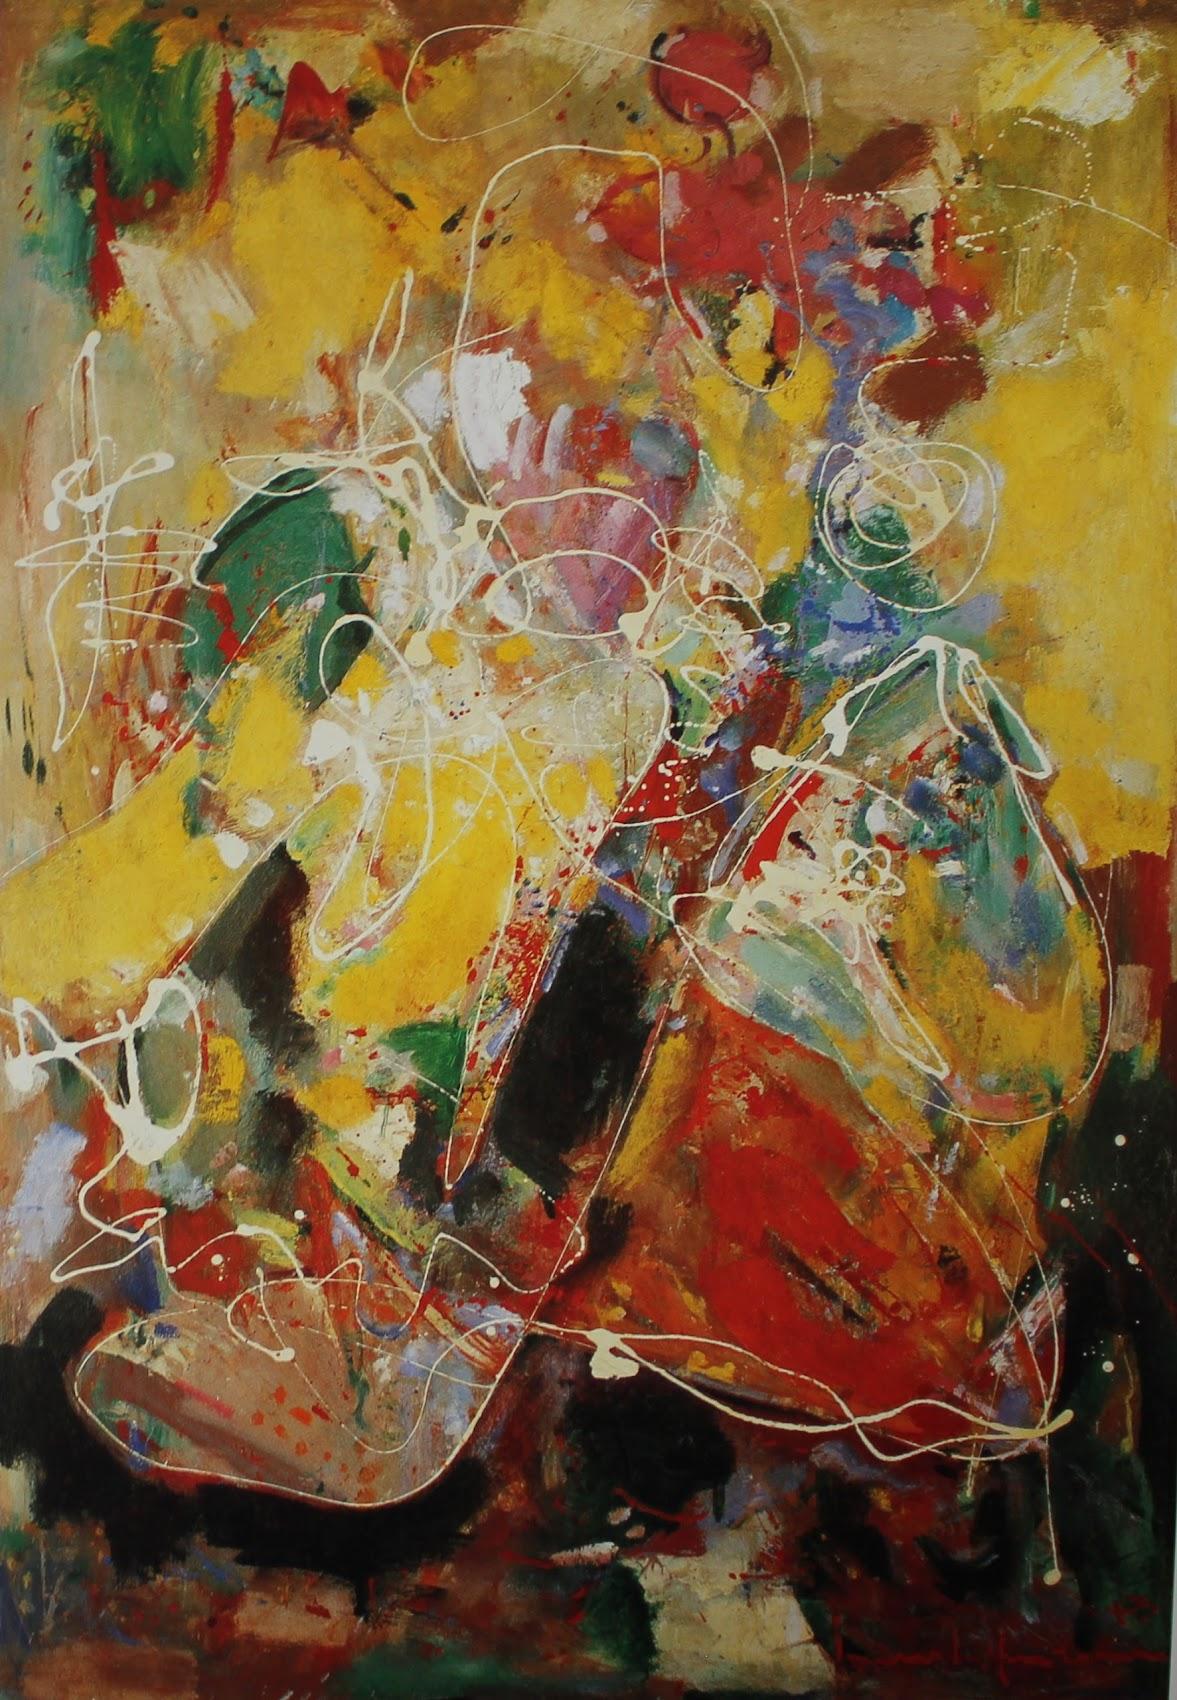 http://4.bp.blogspot.com/-2s0ADyZrt9g/T8PEExF5DhI/AAAAAAAAAm8/90AC2ebfqng/s1700/Hofmann--Fantasia+(1943).JPG